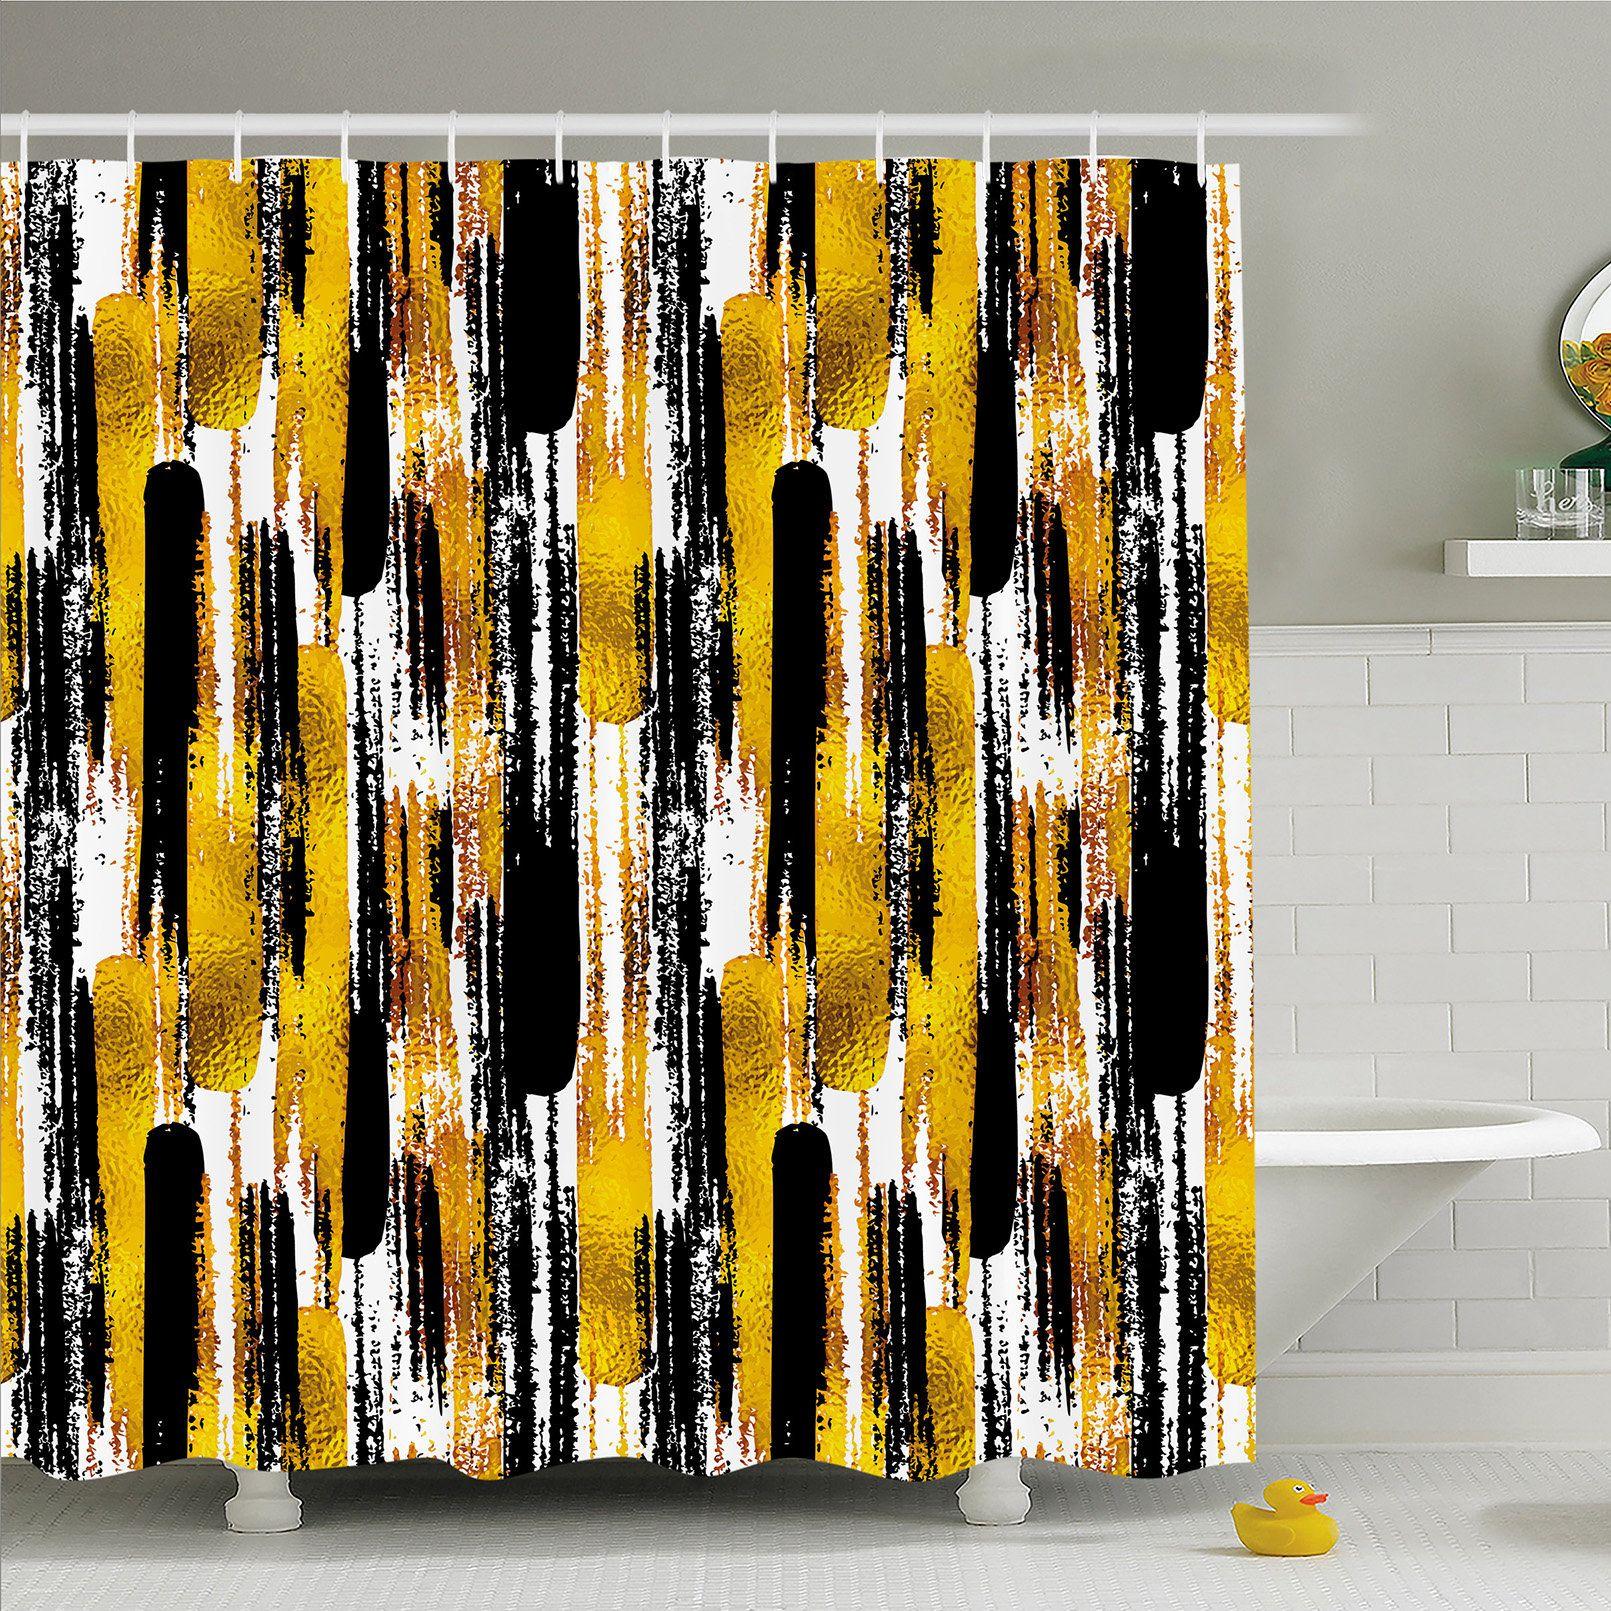 Modern Art Home Grunge Brushstroke Expressionist Background with ...